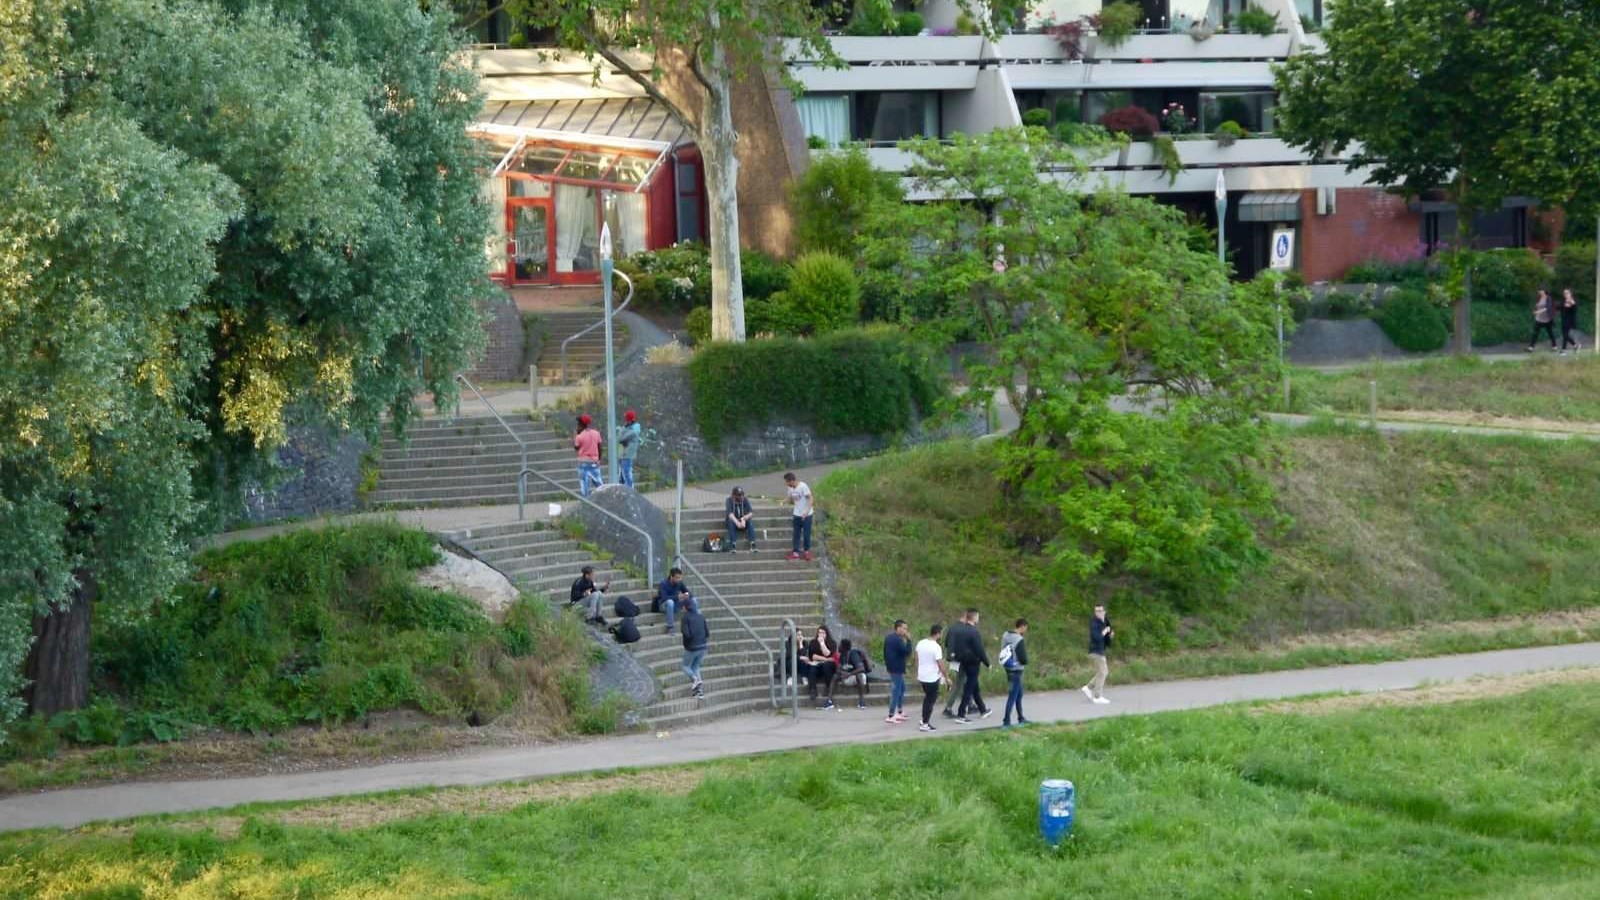 Aufenthaltsort Treppenabgang zum Neckarufer   Foto: M. Schülke